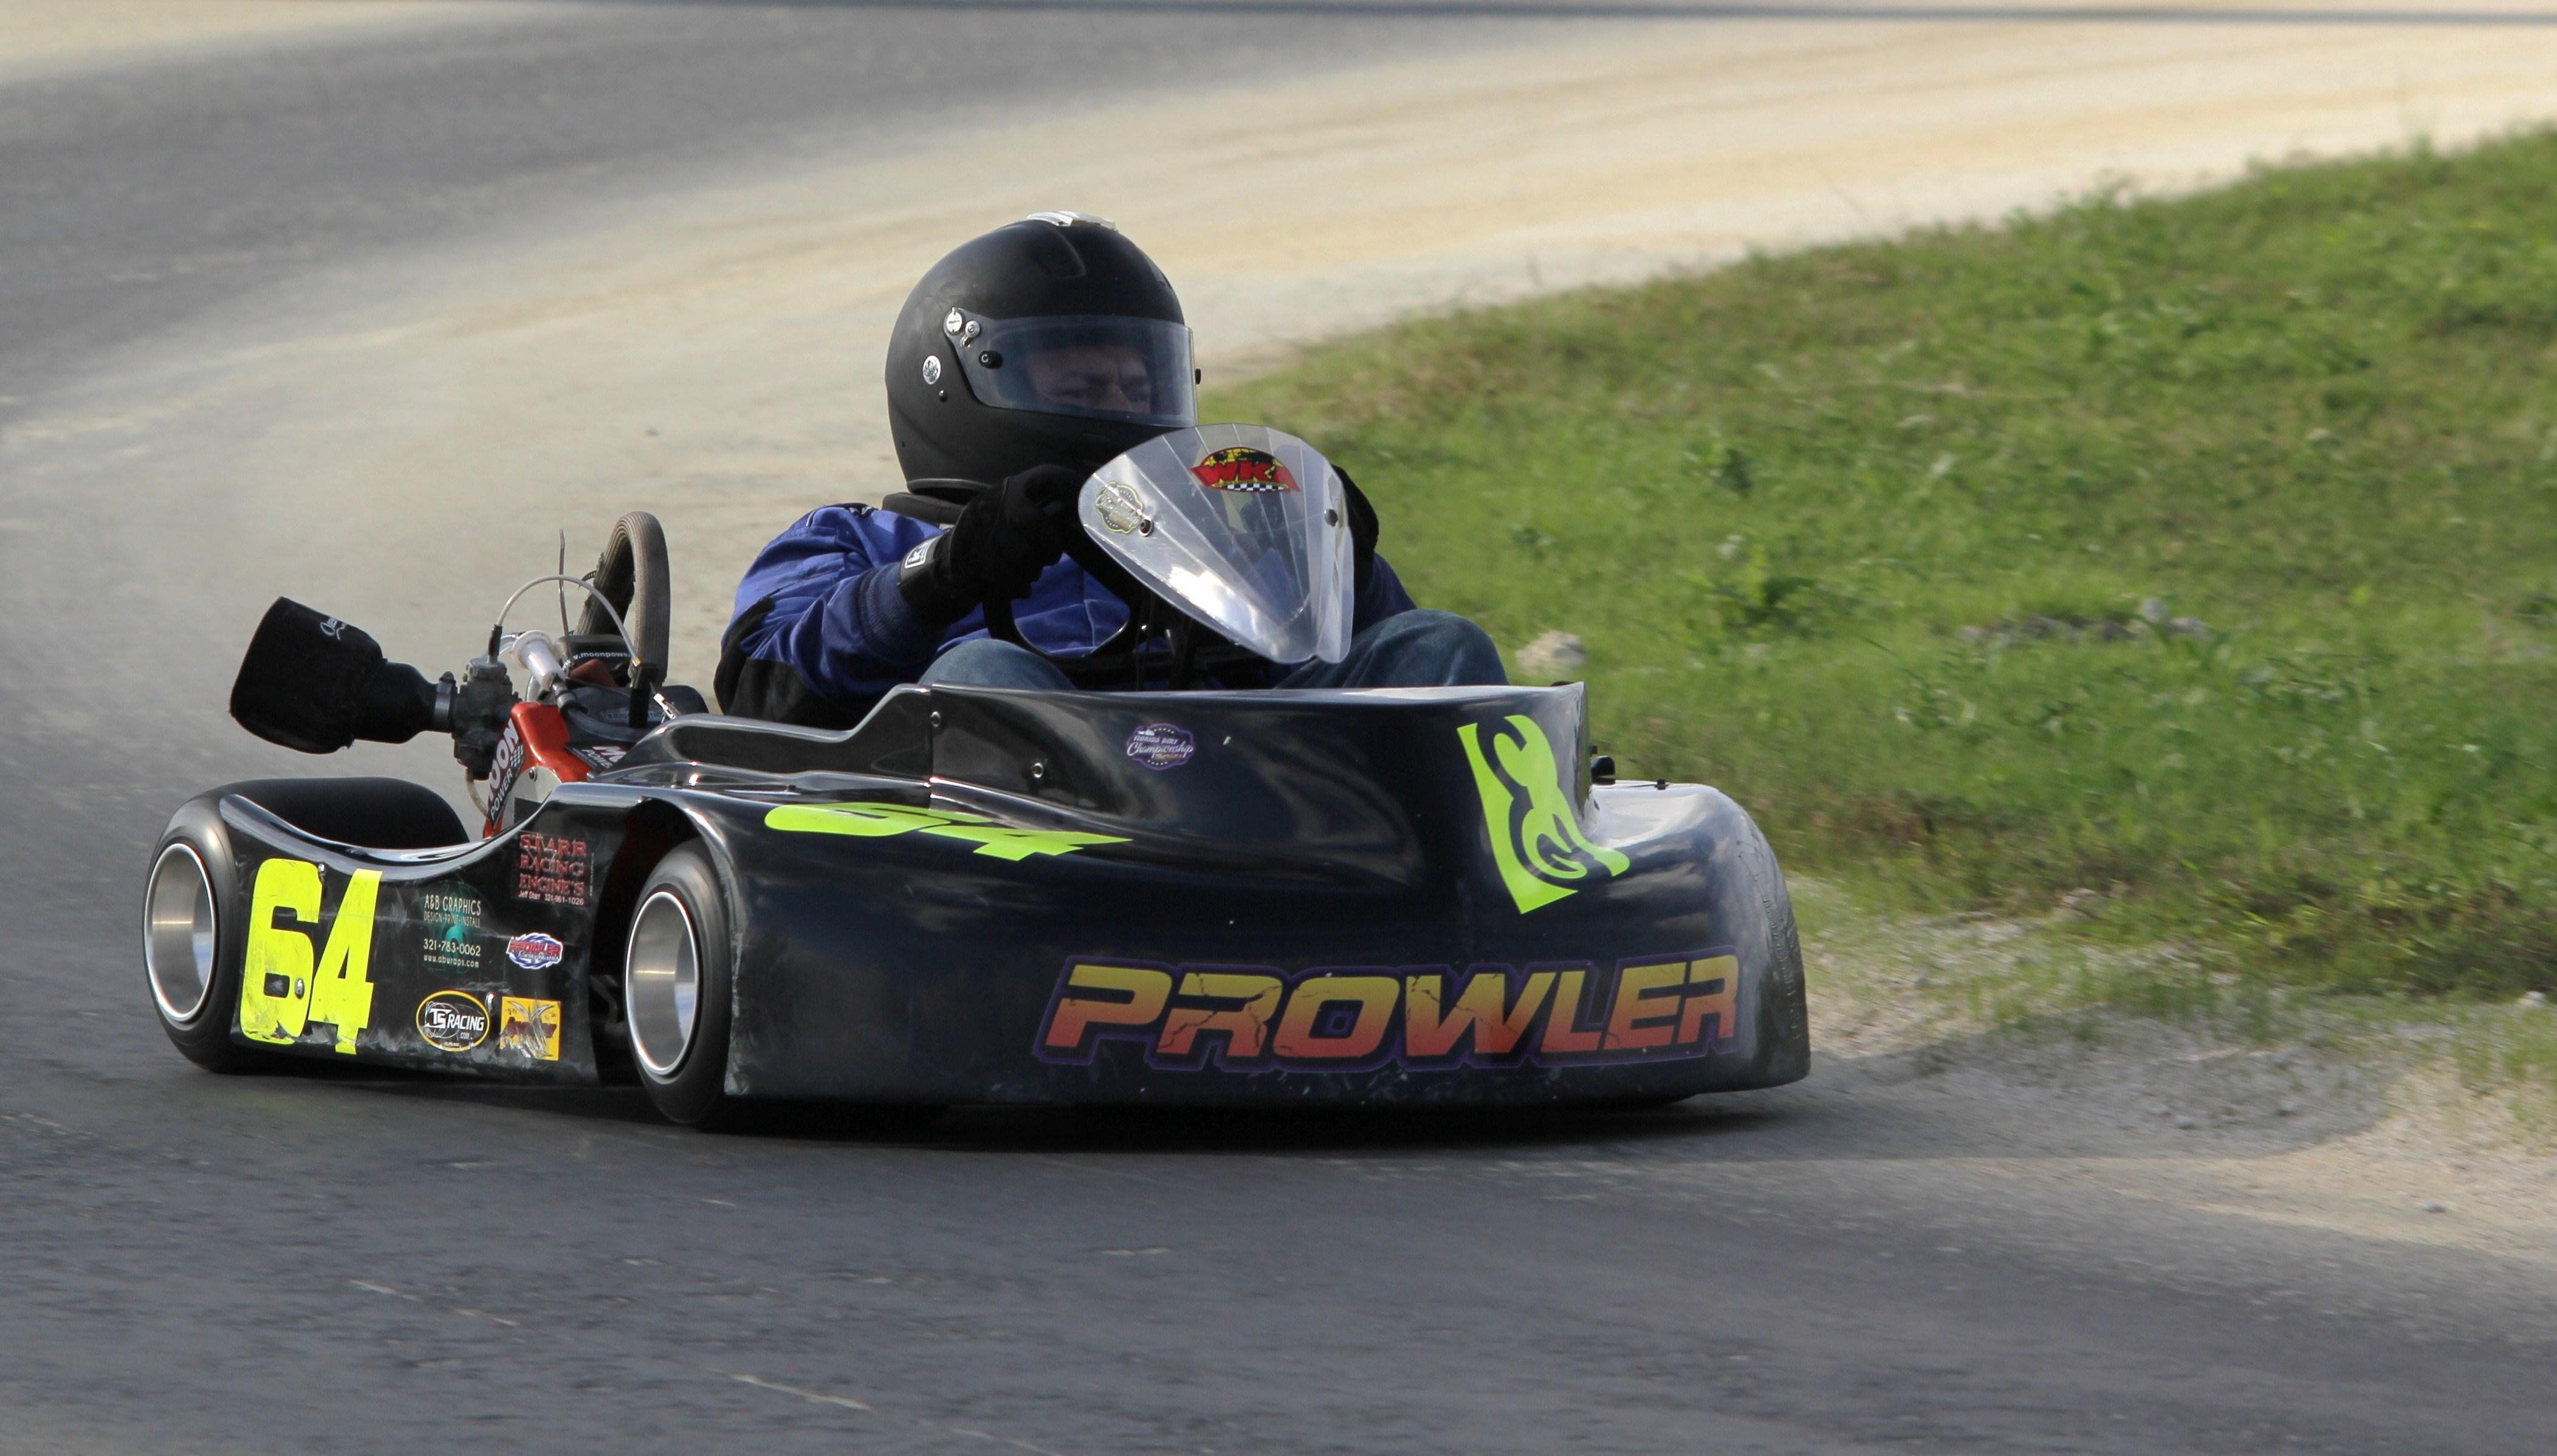 Pictures of Daytona Kart Racing